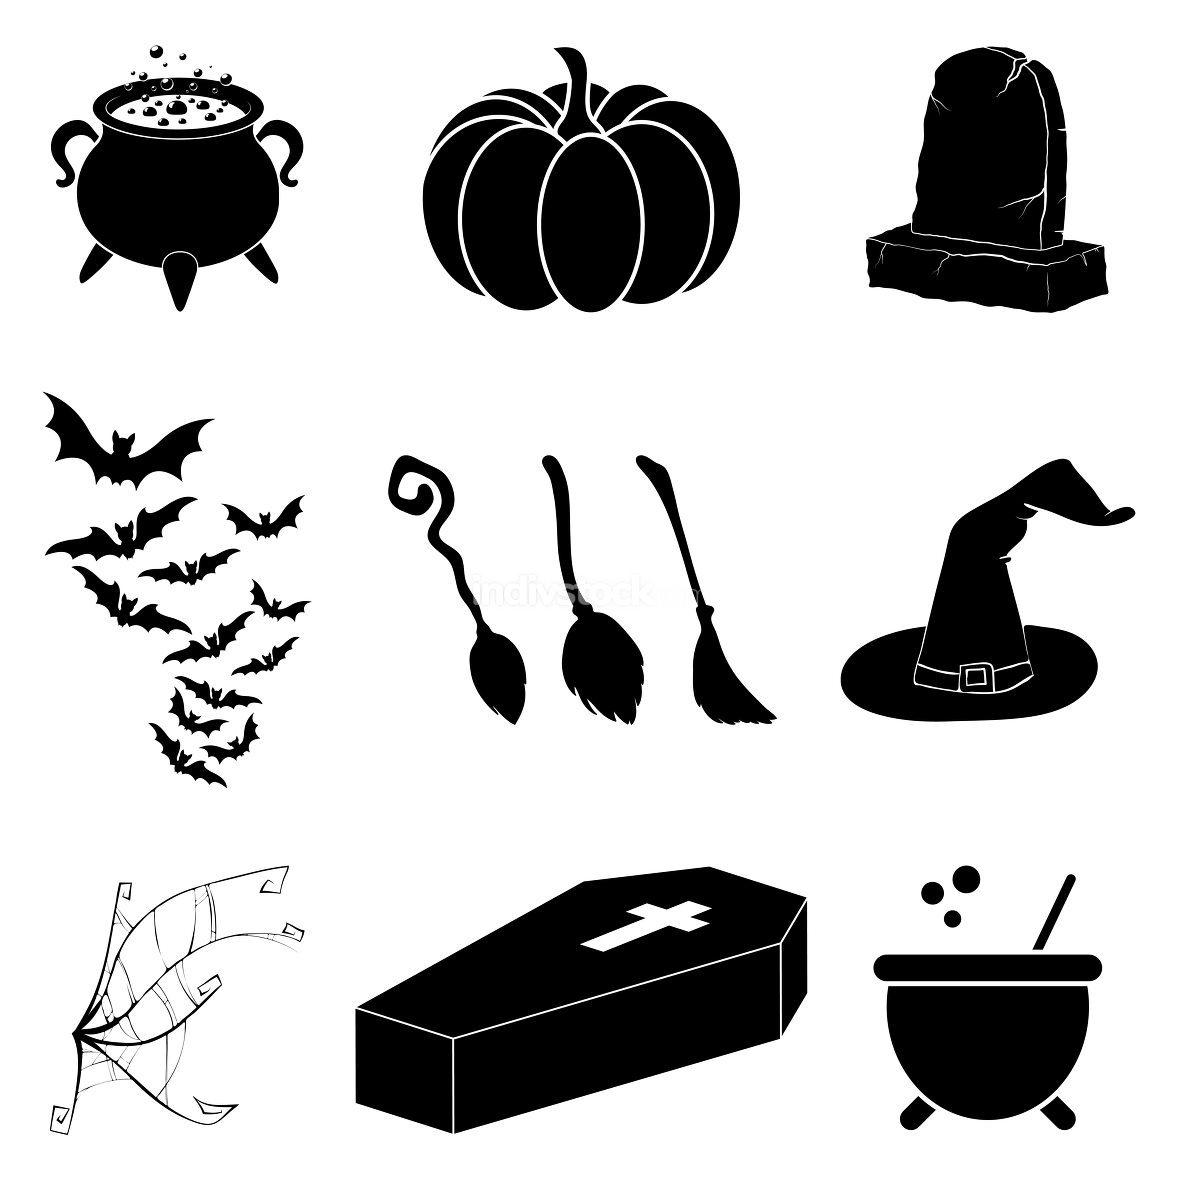 Halloween silhouette vector set. Collection of black illustration for horror holiday celebration. Creepy october cartoon symbols